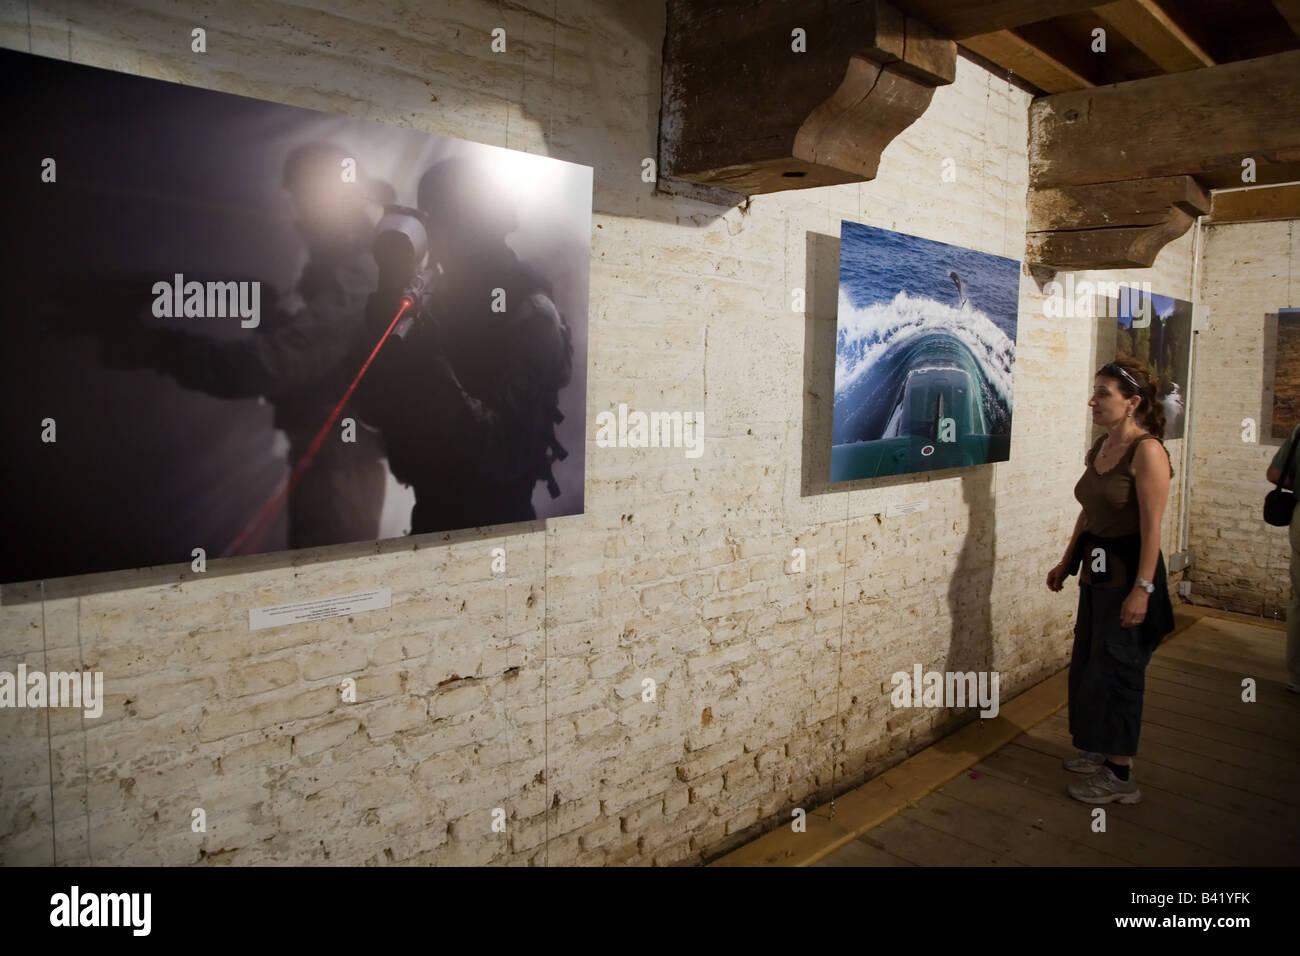 Visa Pour l'Image Exhibition Ziv Koren in Perpignan France - Stock Image